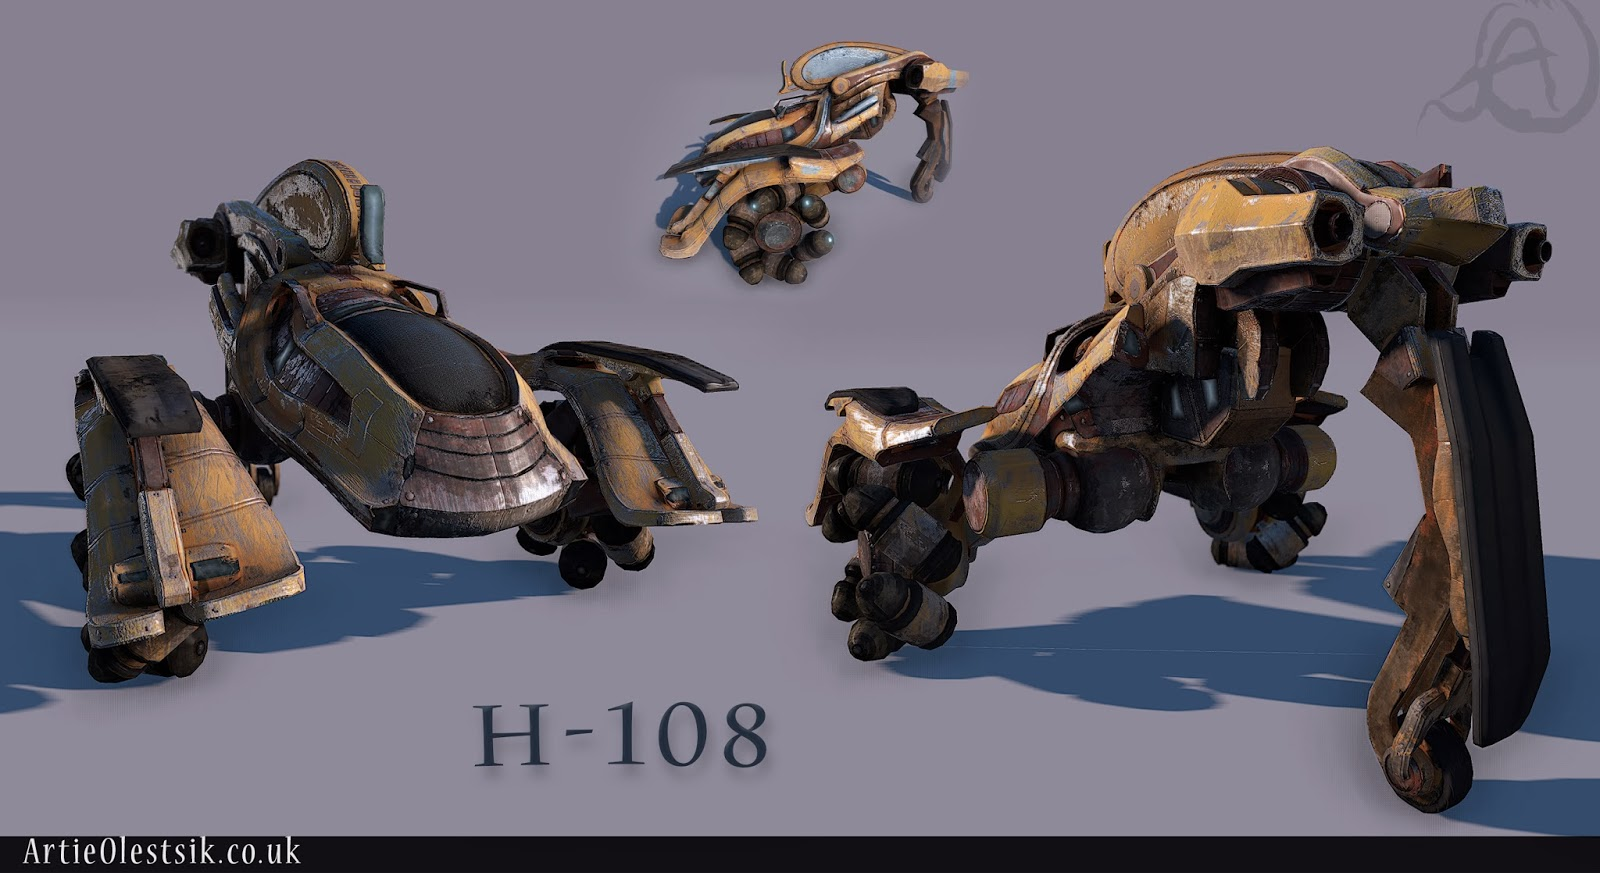 h-108_001.jpg